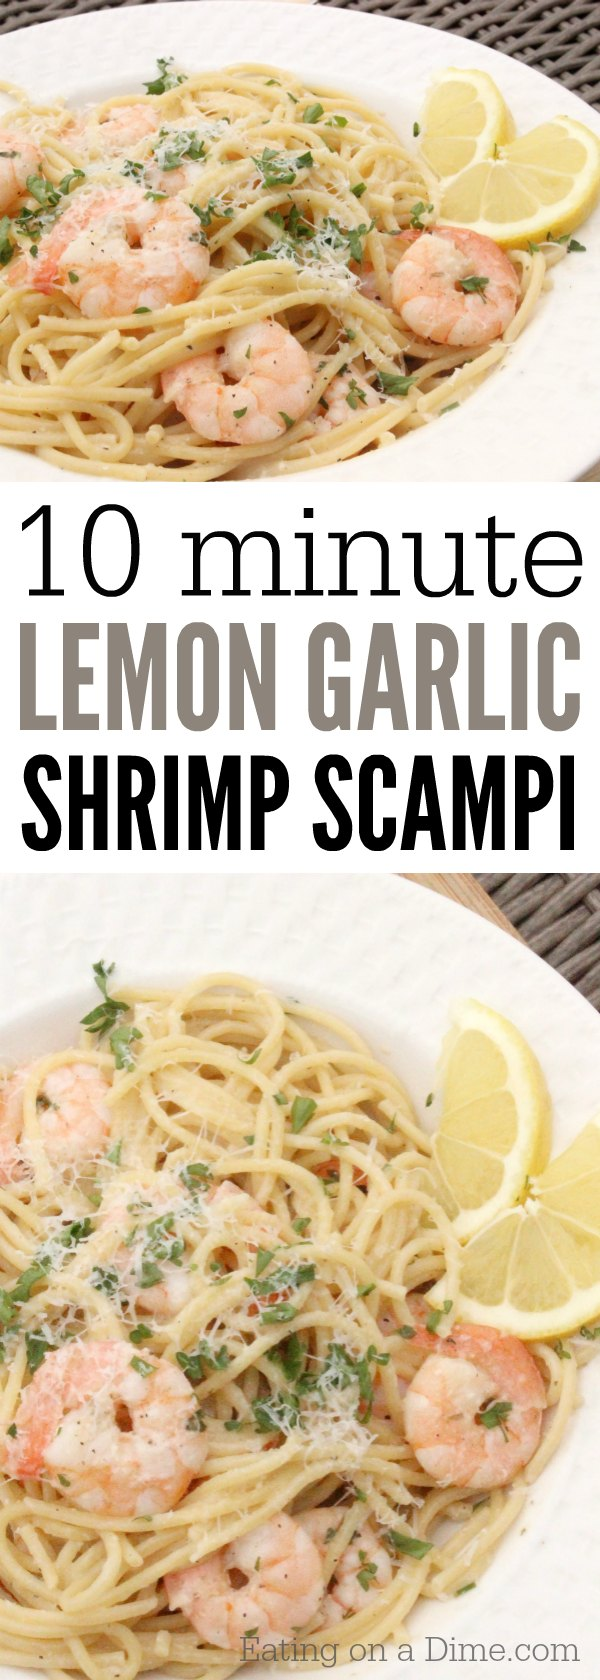 Easy 10 Minute Shrimp Scampi Recipe foto